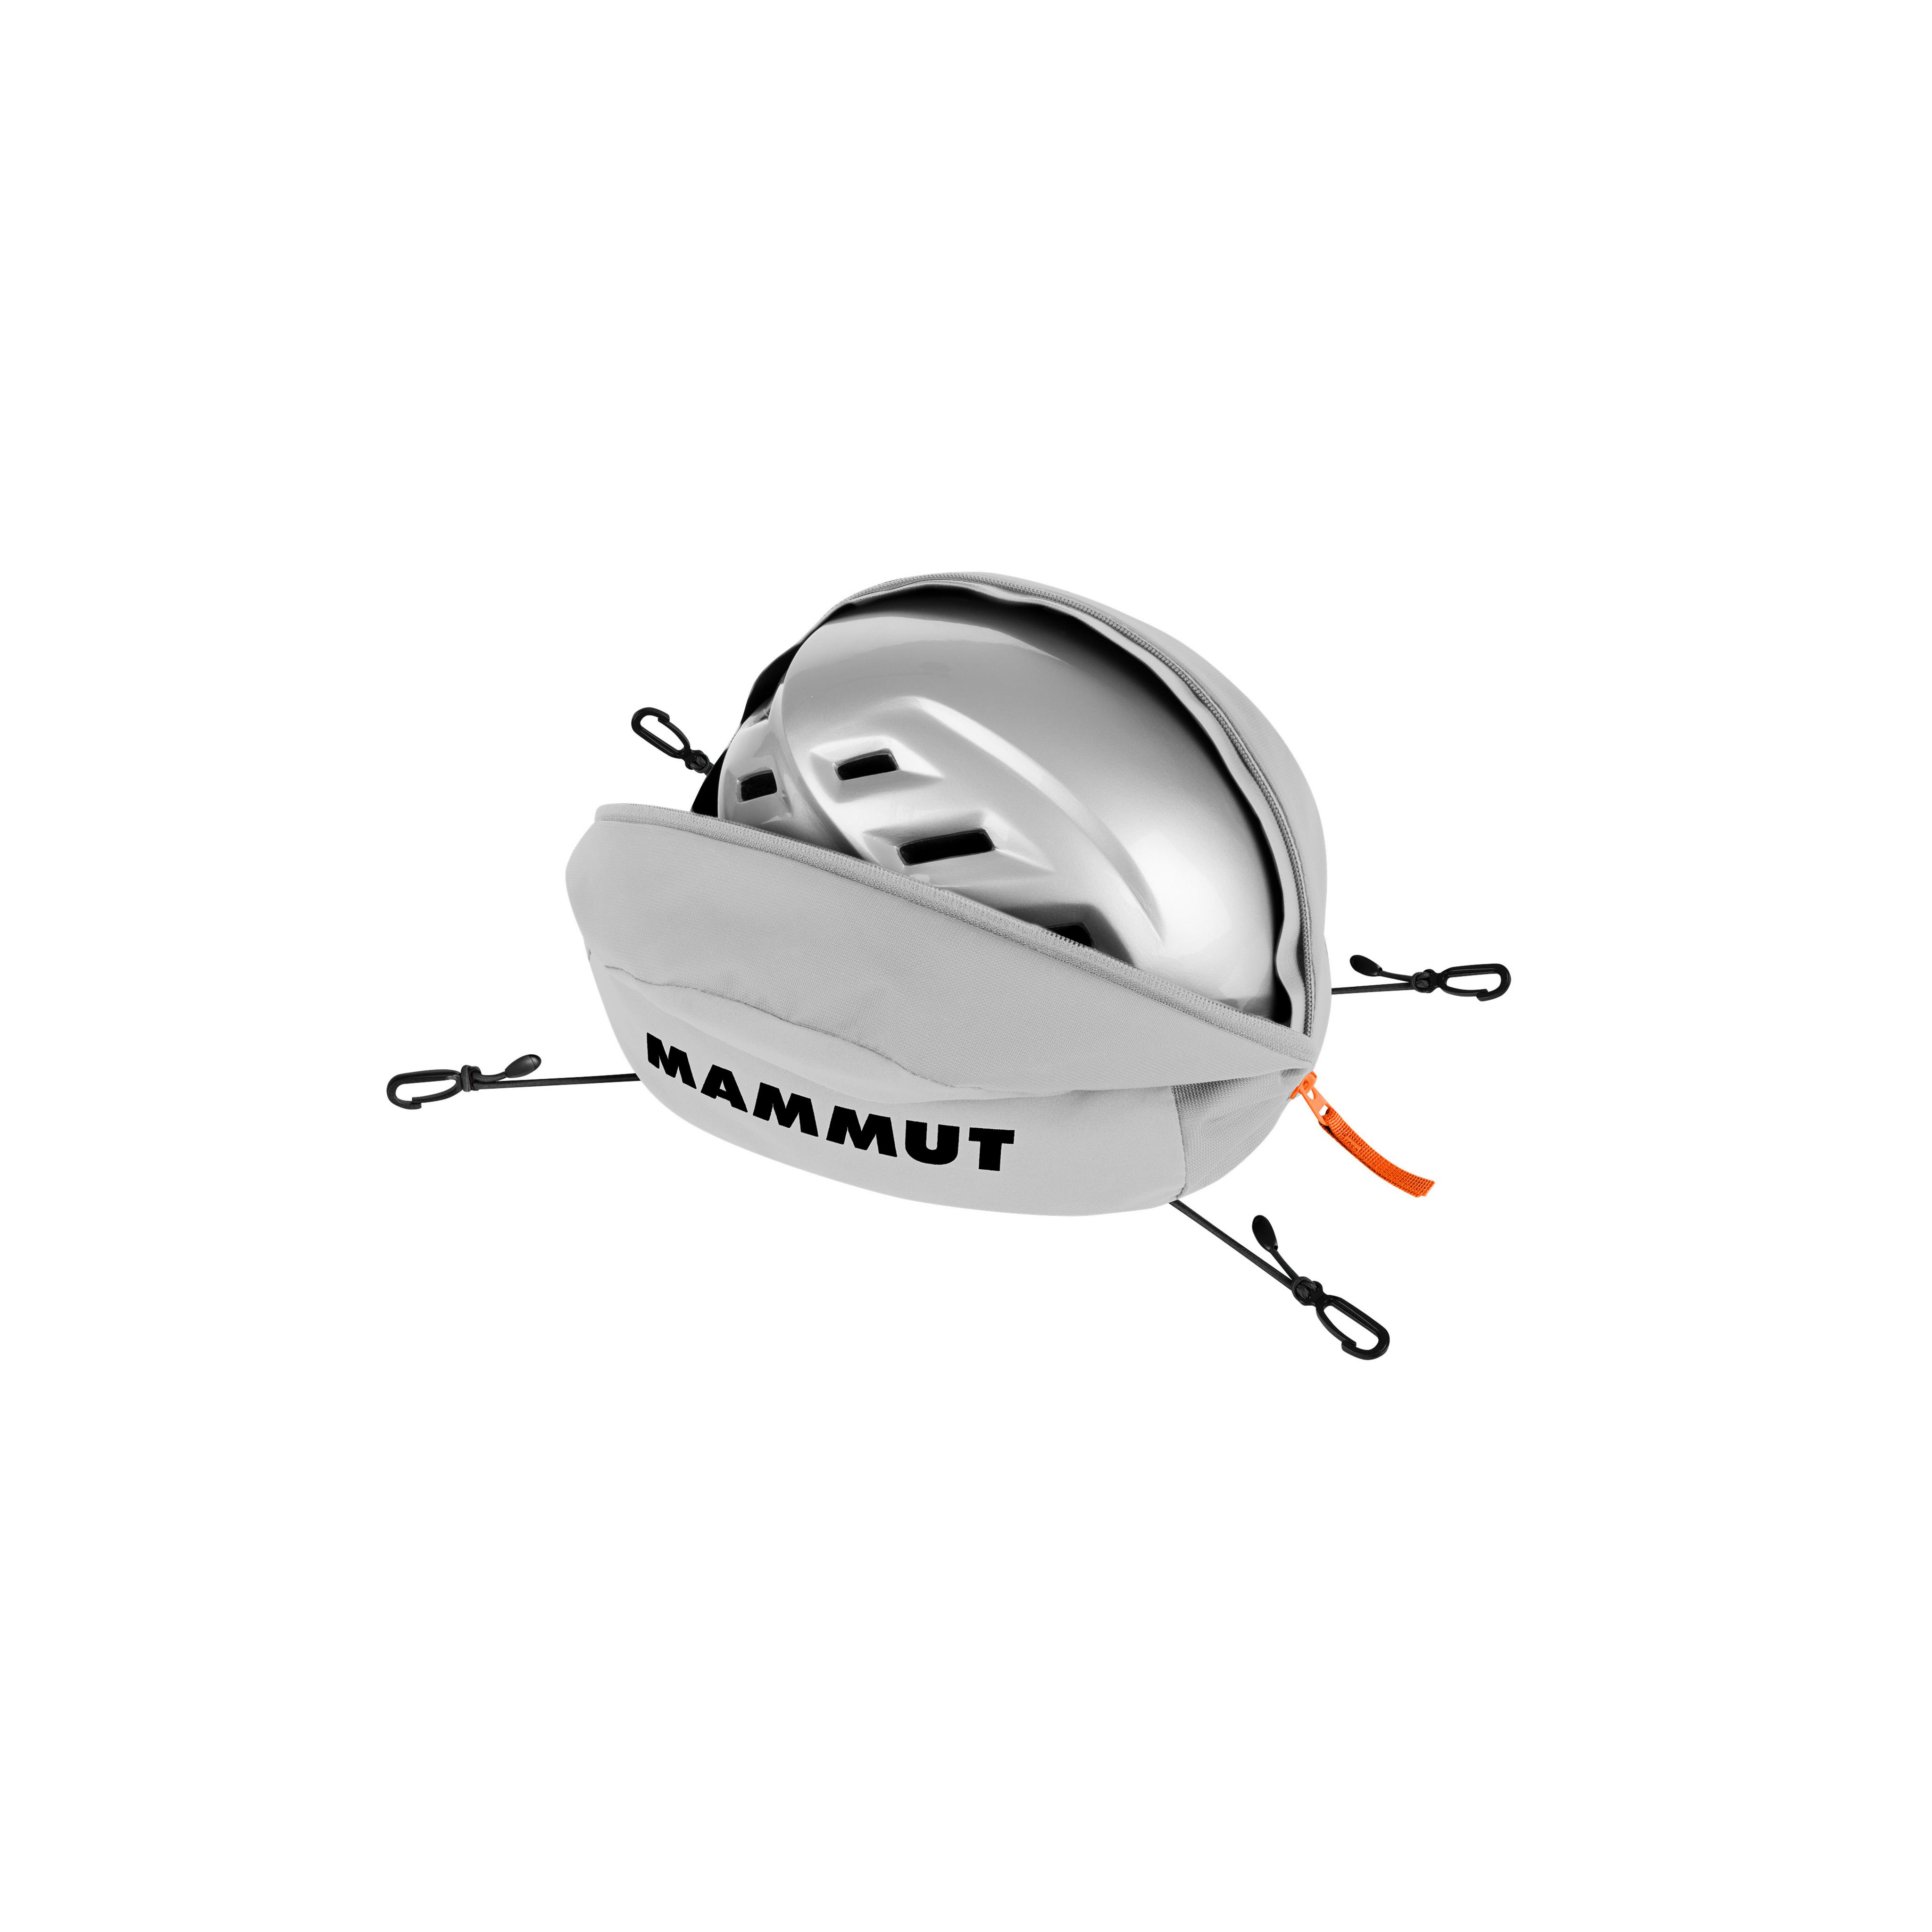 Helmet Holder Pro - highway, one size thumbnail